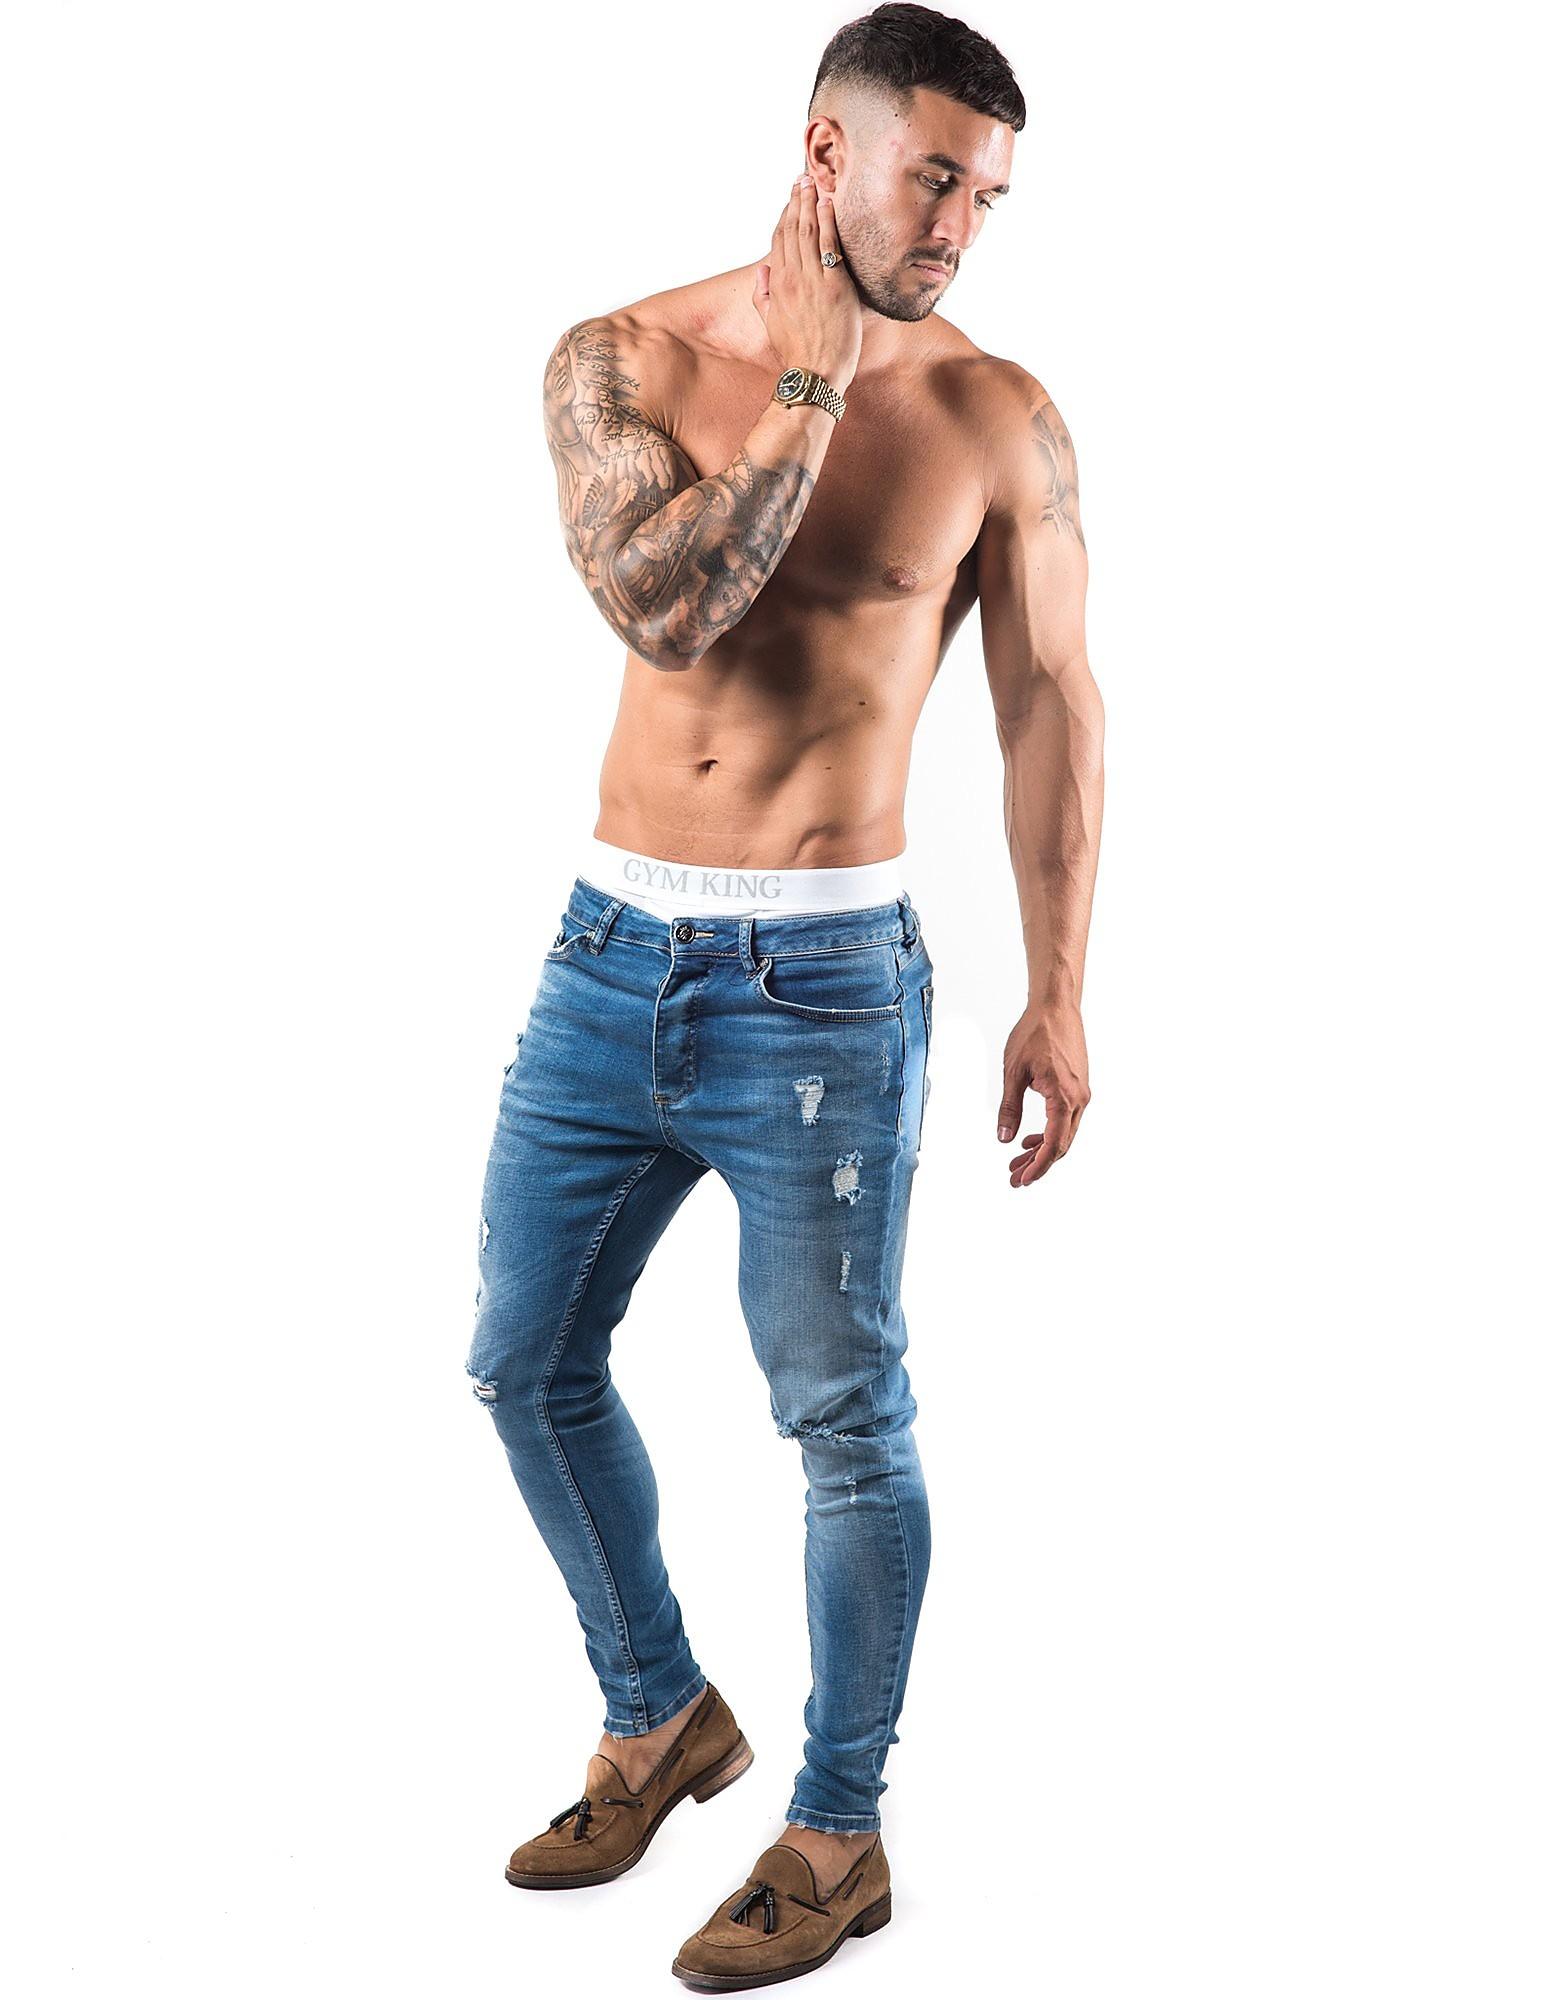 Gym King Distressed Denim Jeans